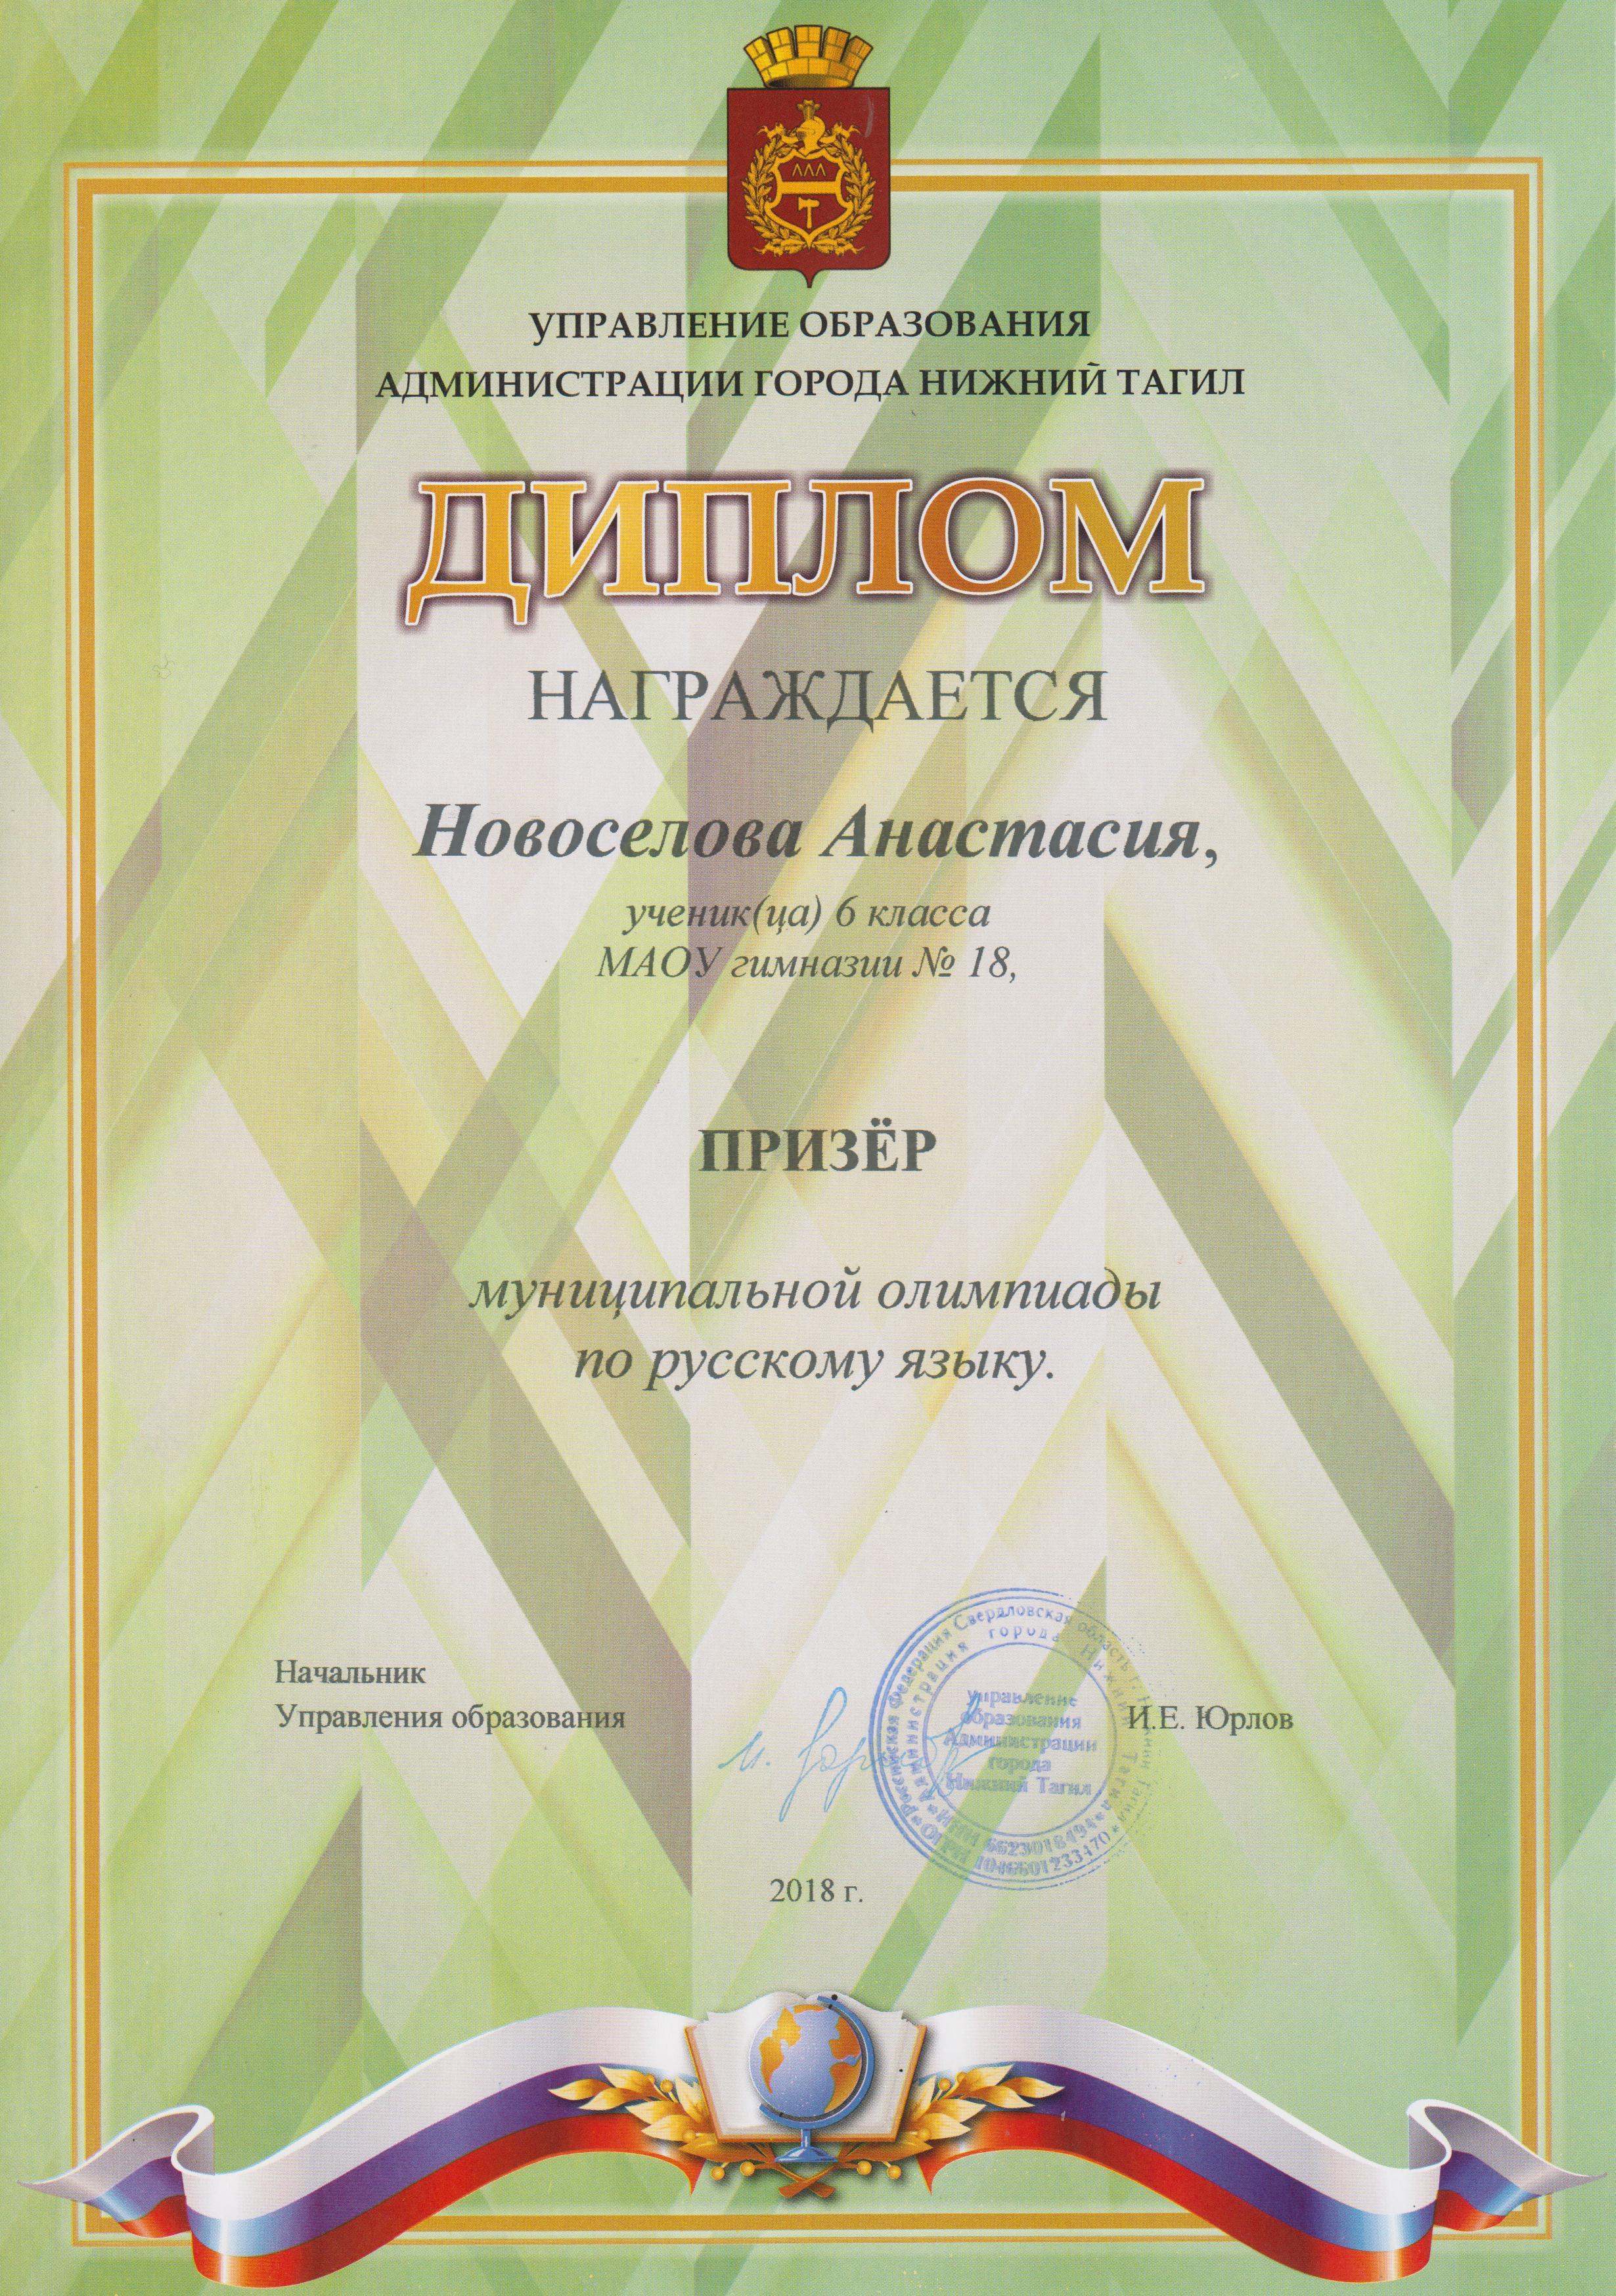 Ол. РЯ. Новоселова. 2018